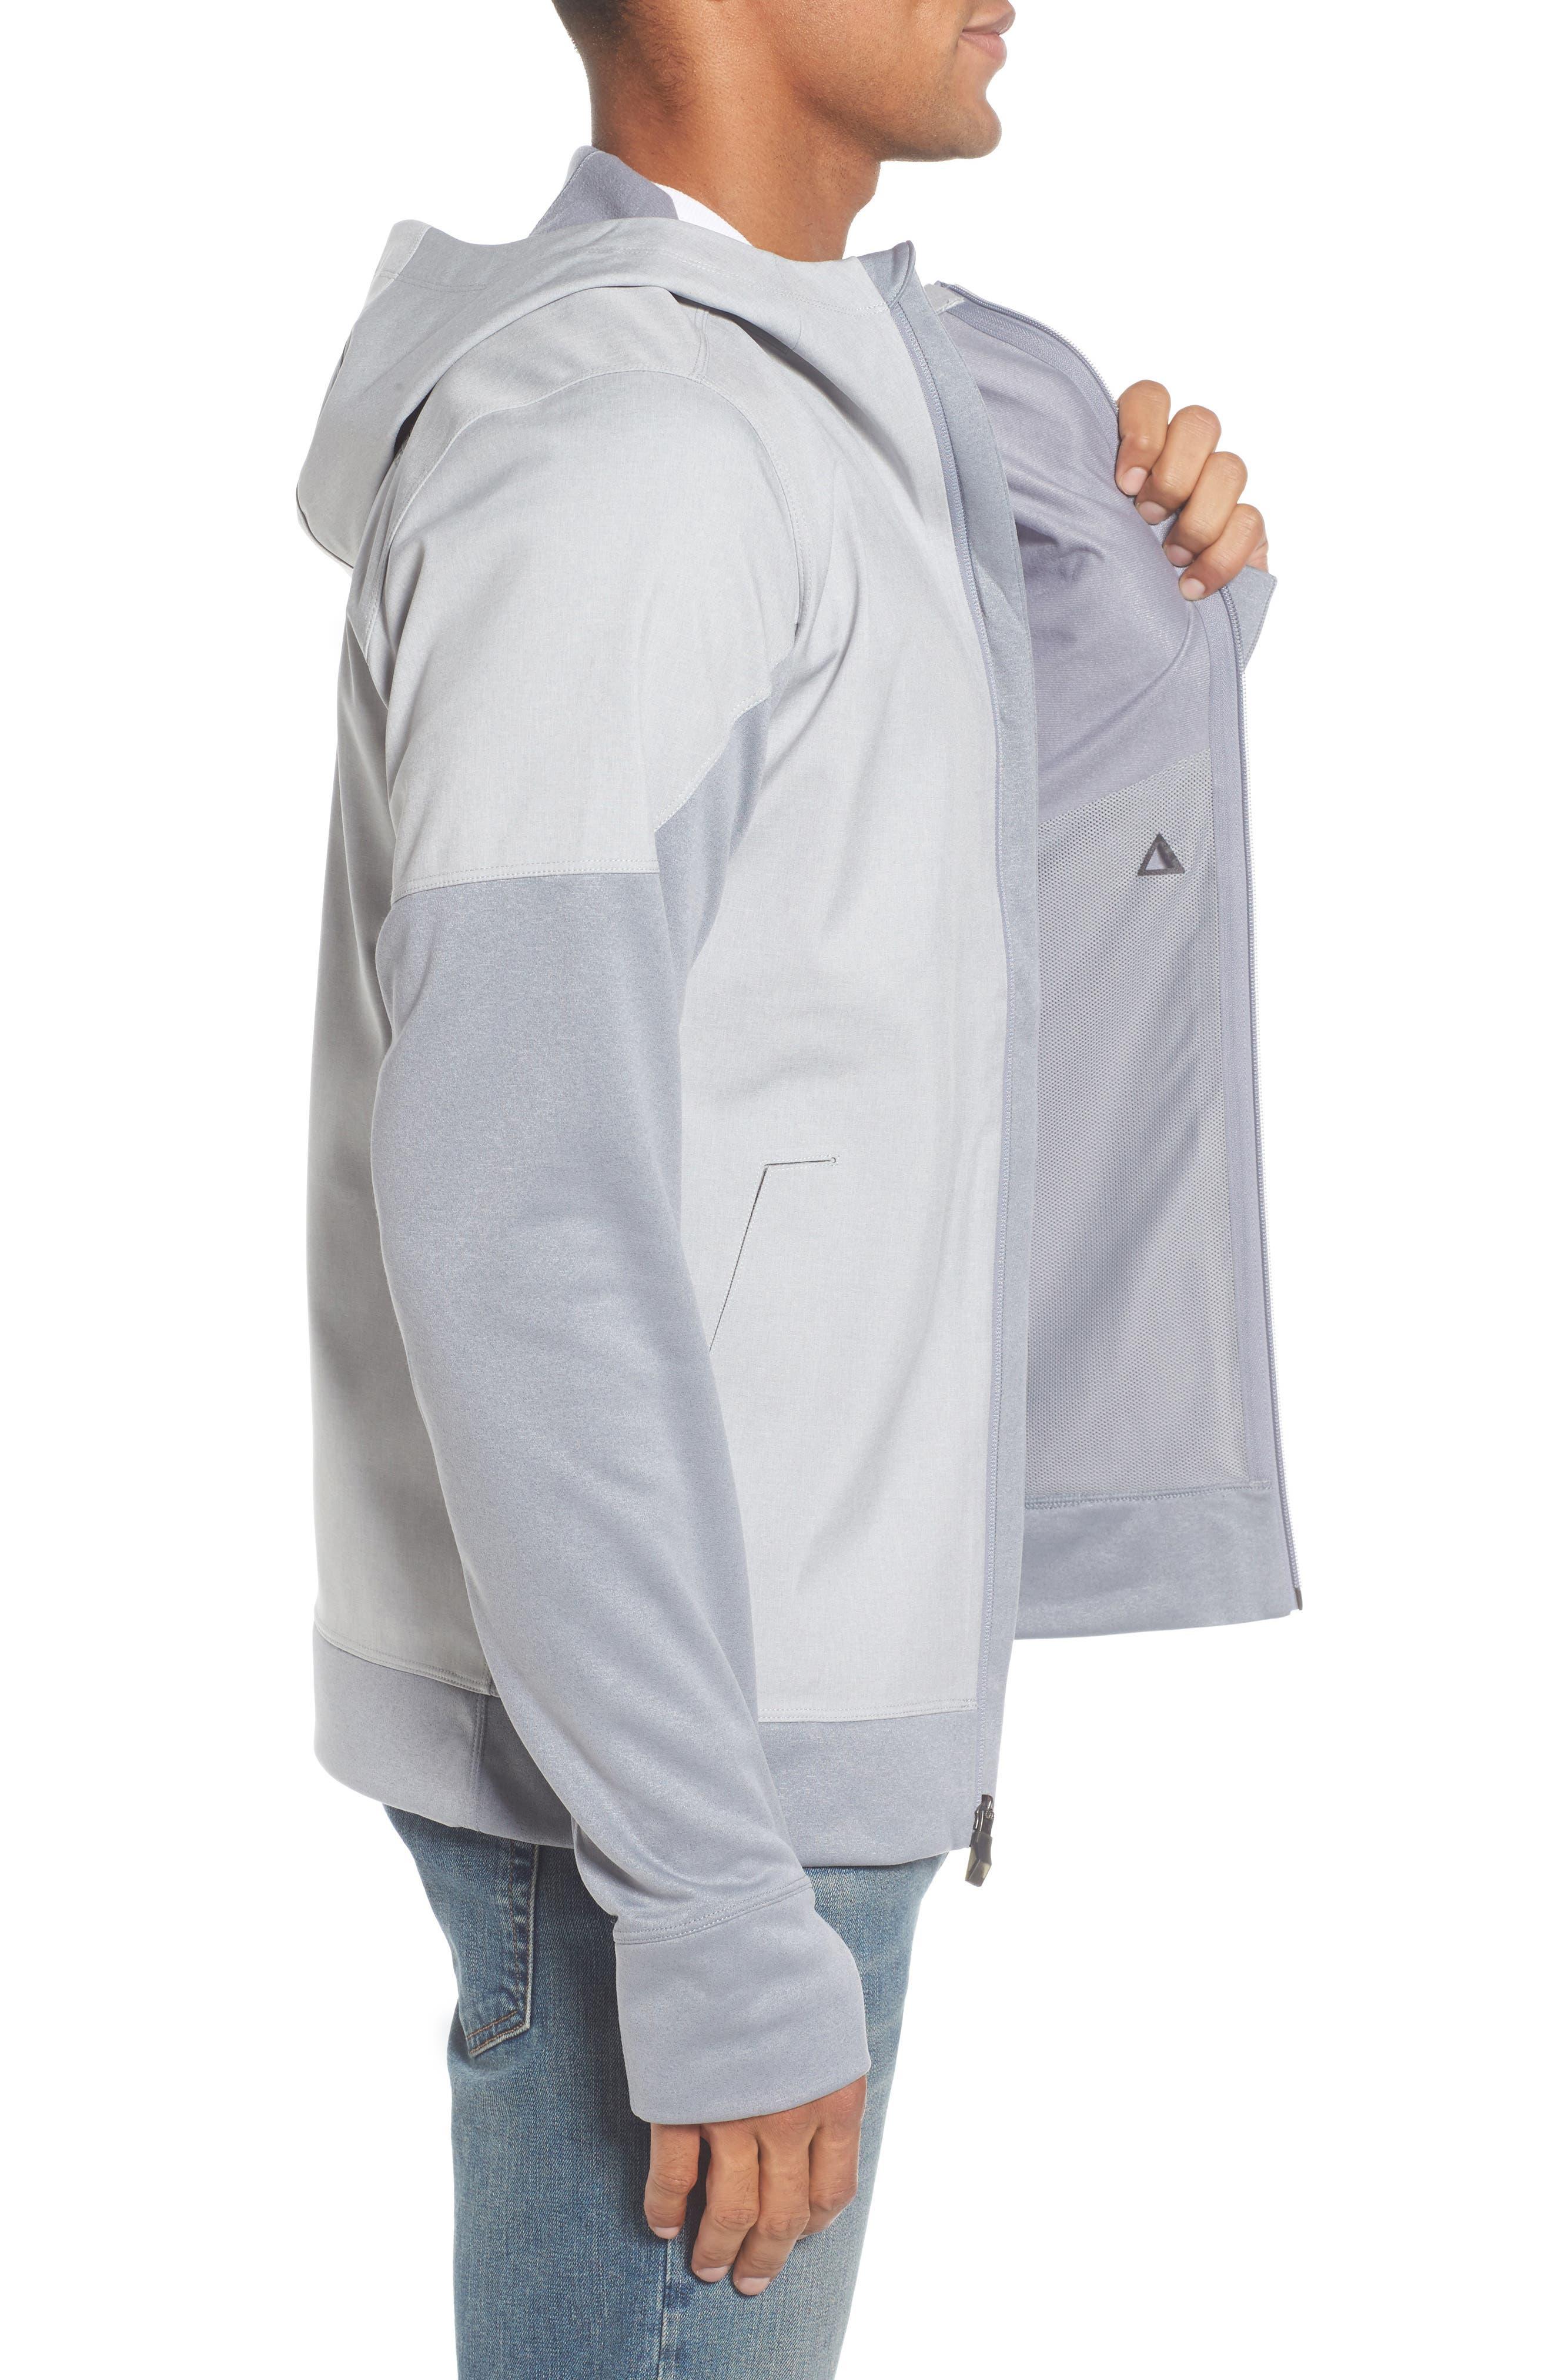 'Kilowatt' Hooded Jacket,                             Alternate thumbnail 3, color,                             Tnf Light Grey Heather